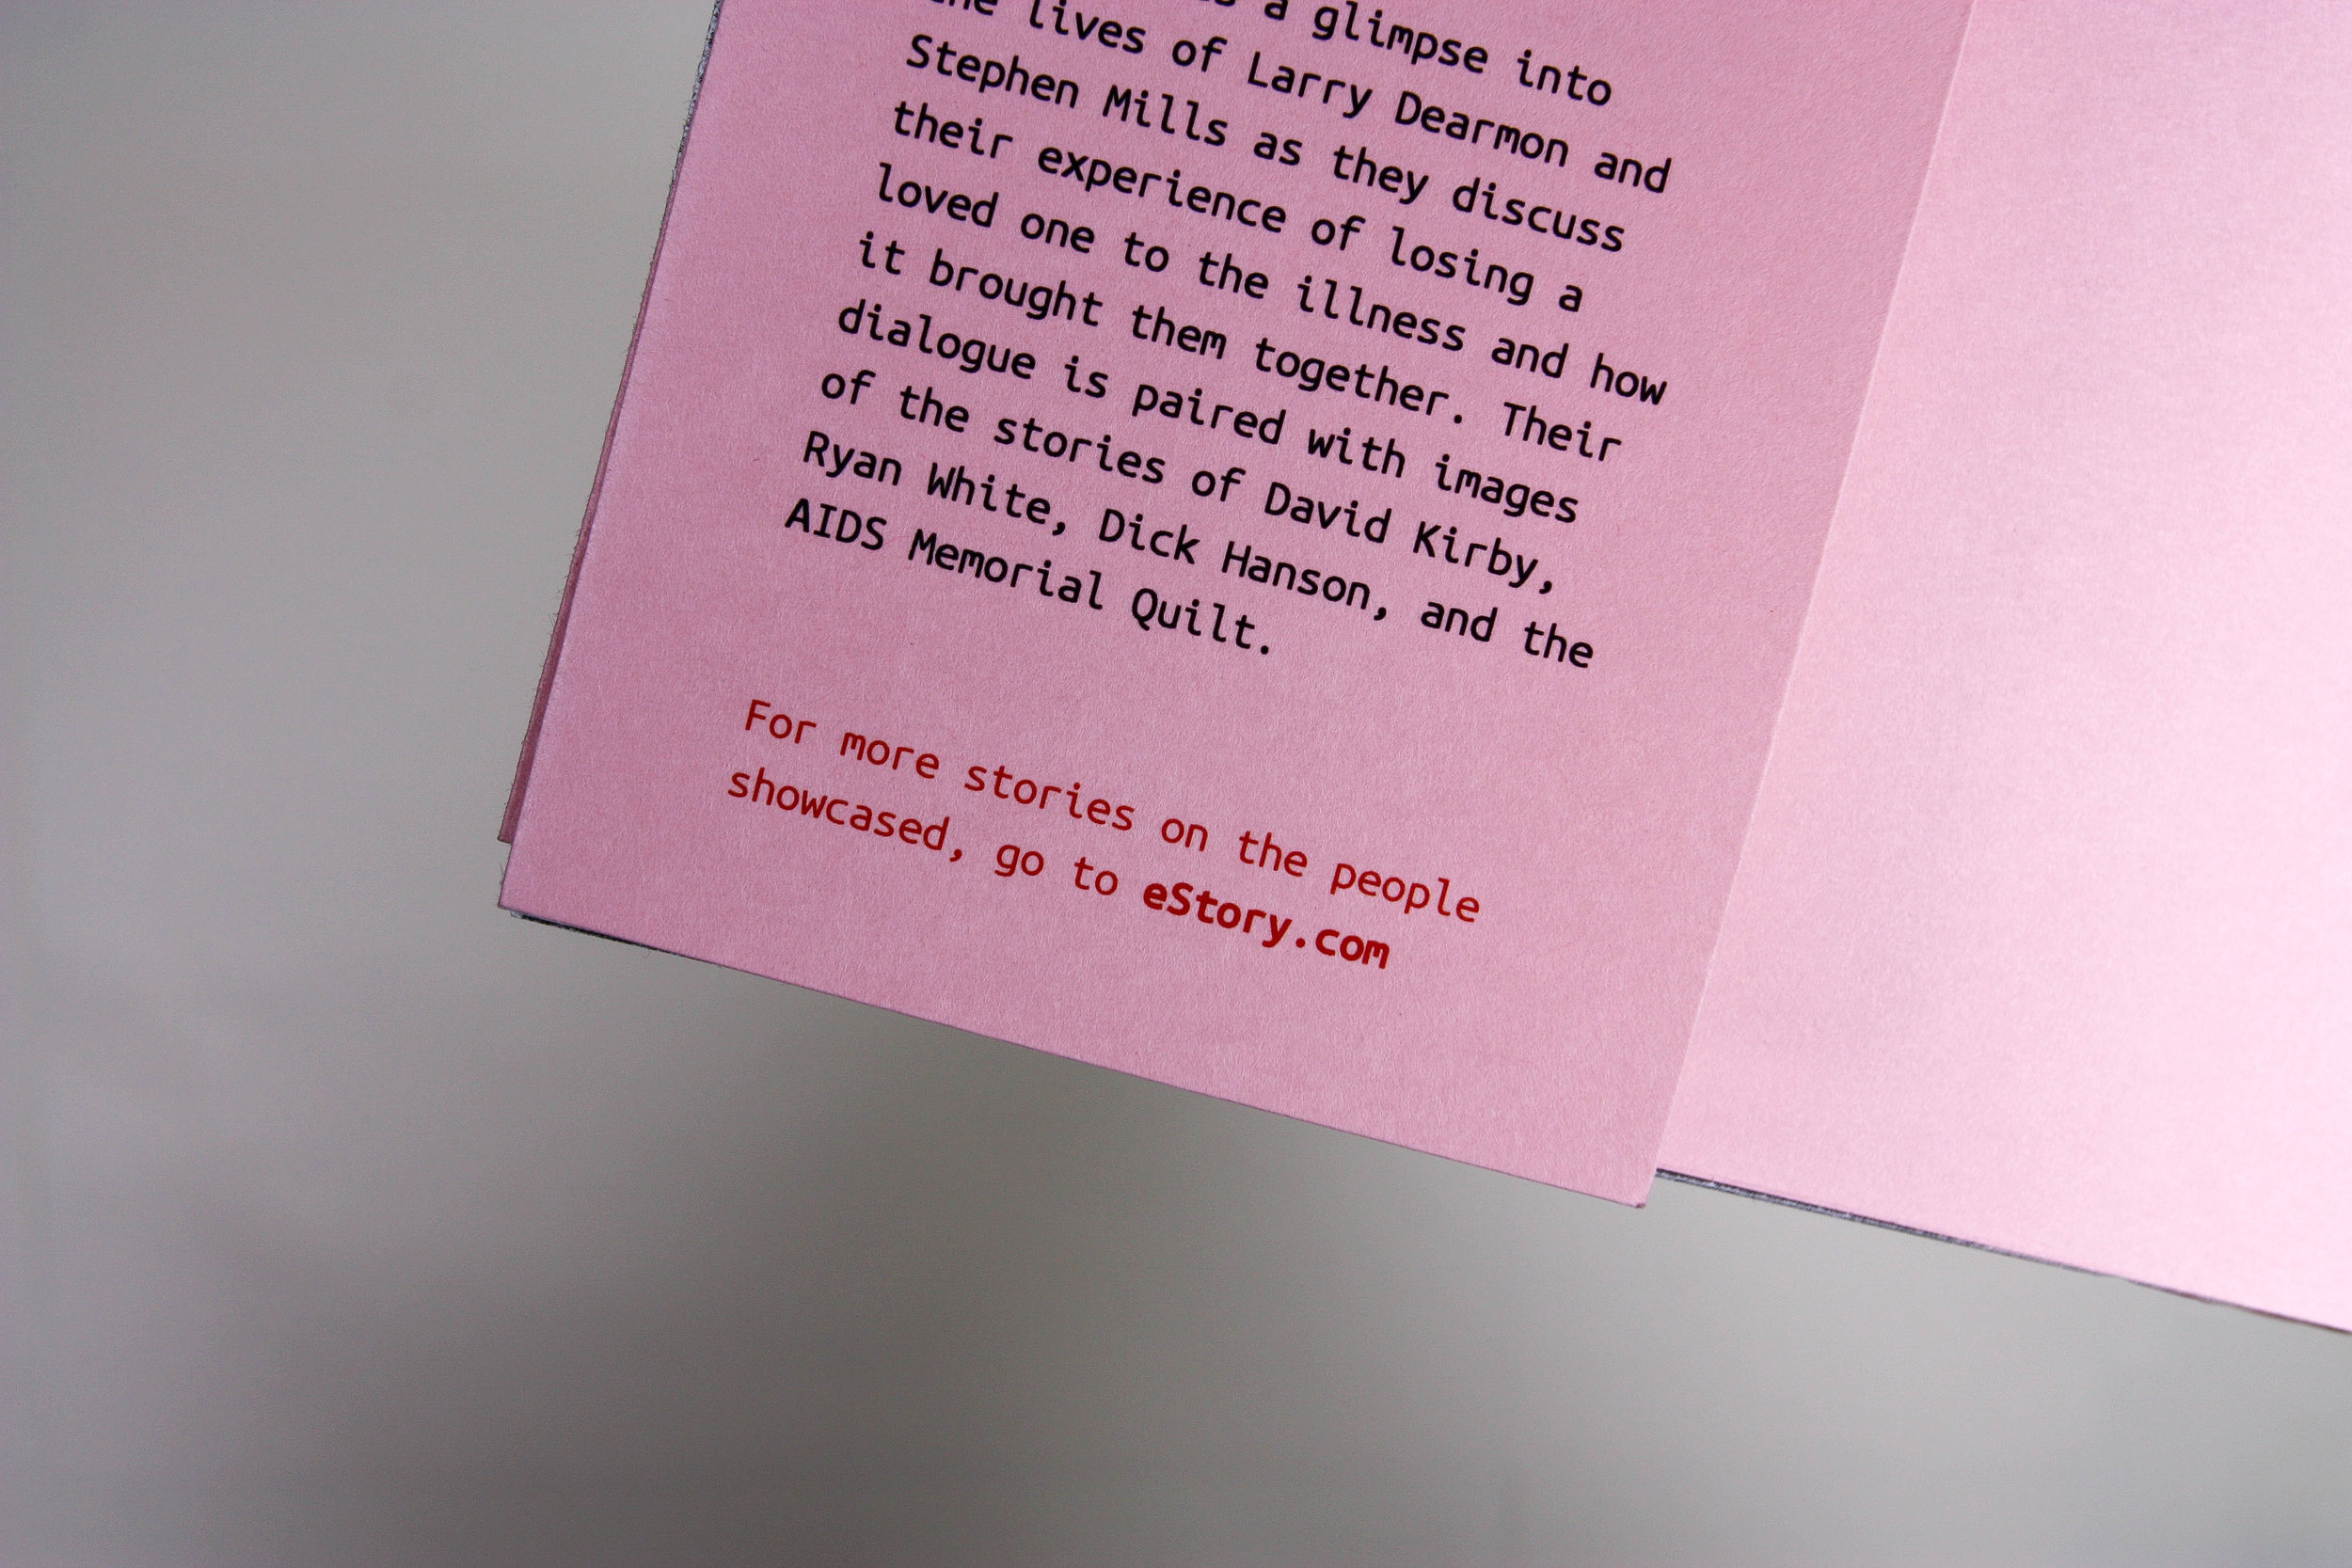 estory-bookimages-36.jpg